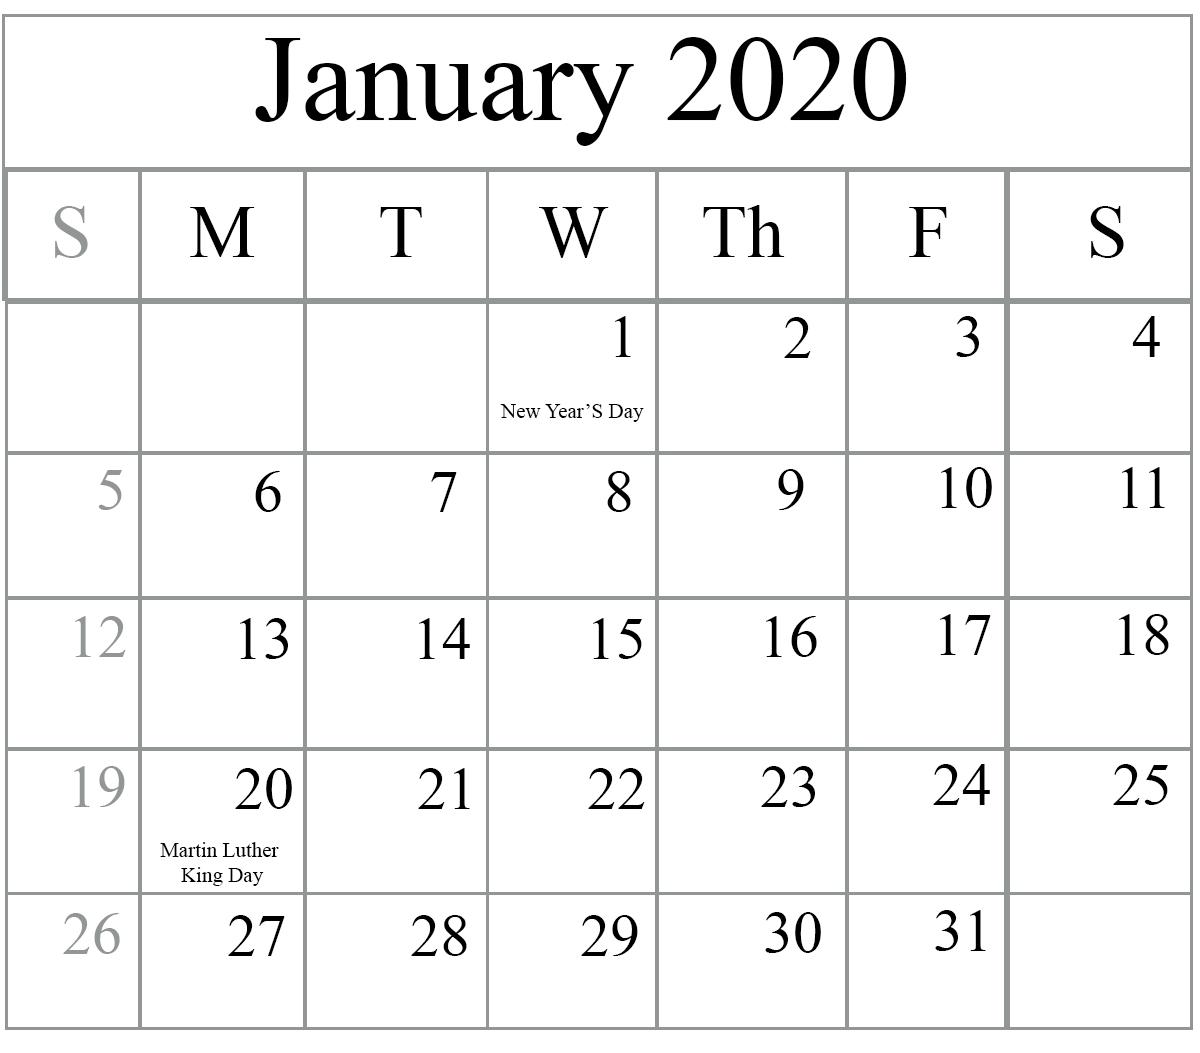 Free Printable 2020 Calendar To I Can Edit - Calendar Calendar I Can Edit